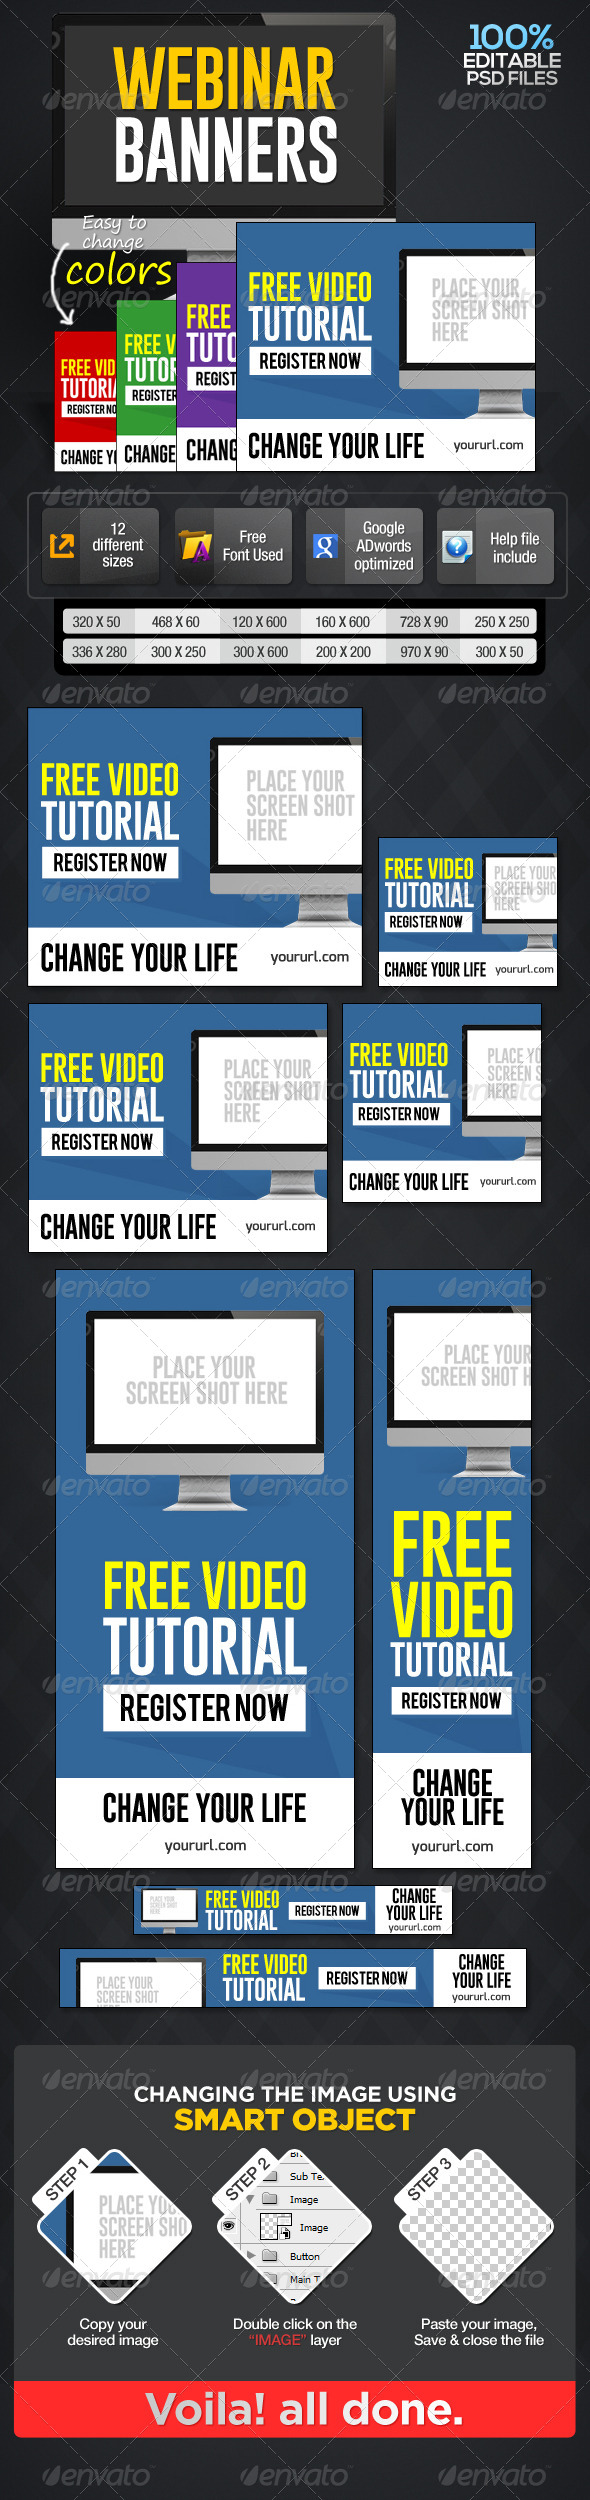 Webinar Banners - Banners & Ads Web Elements